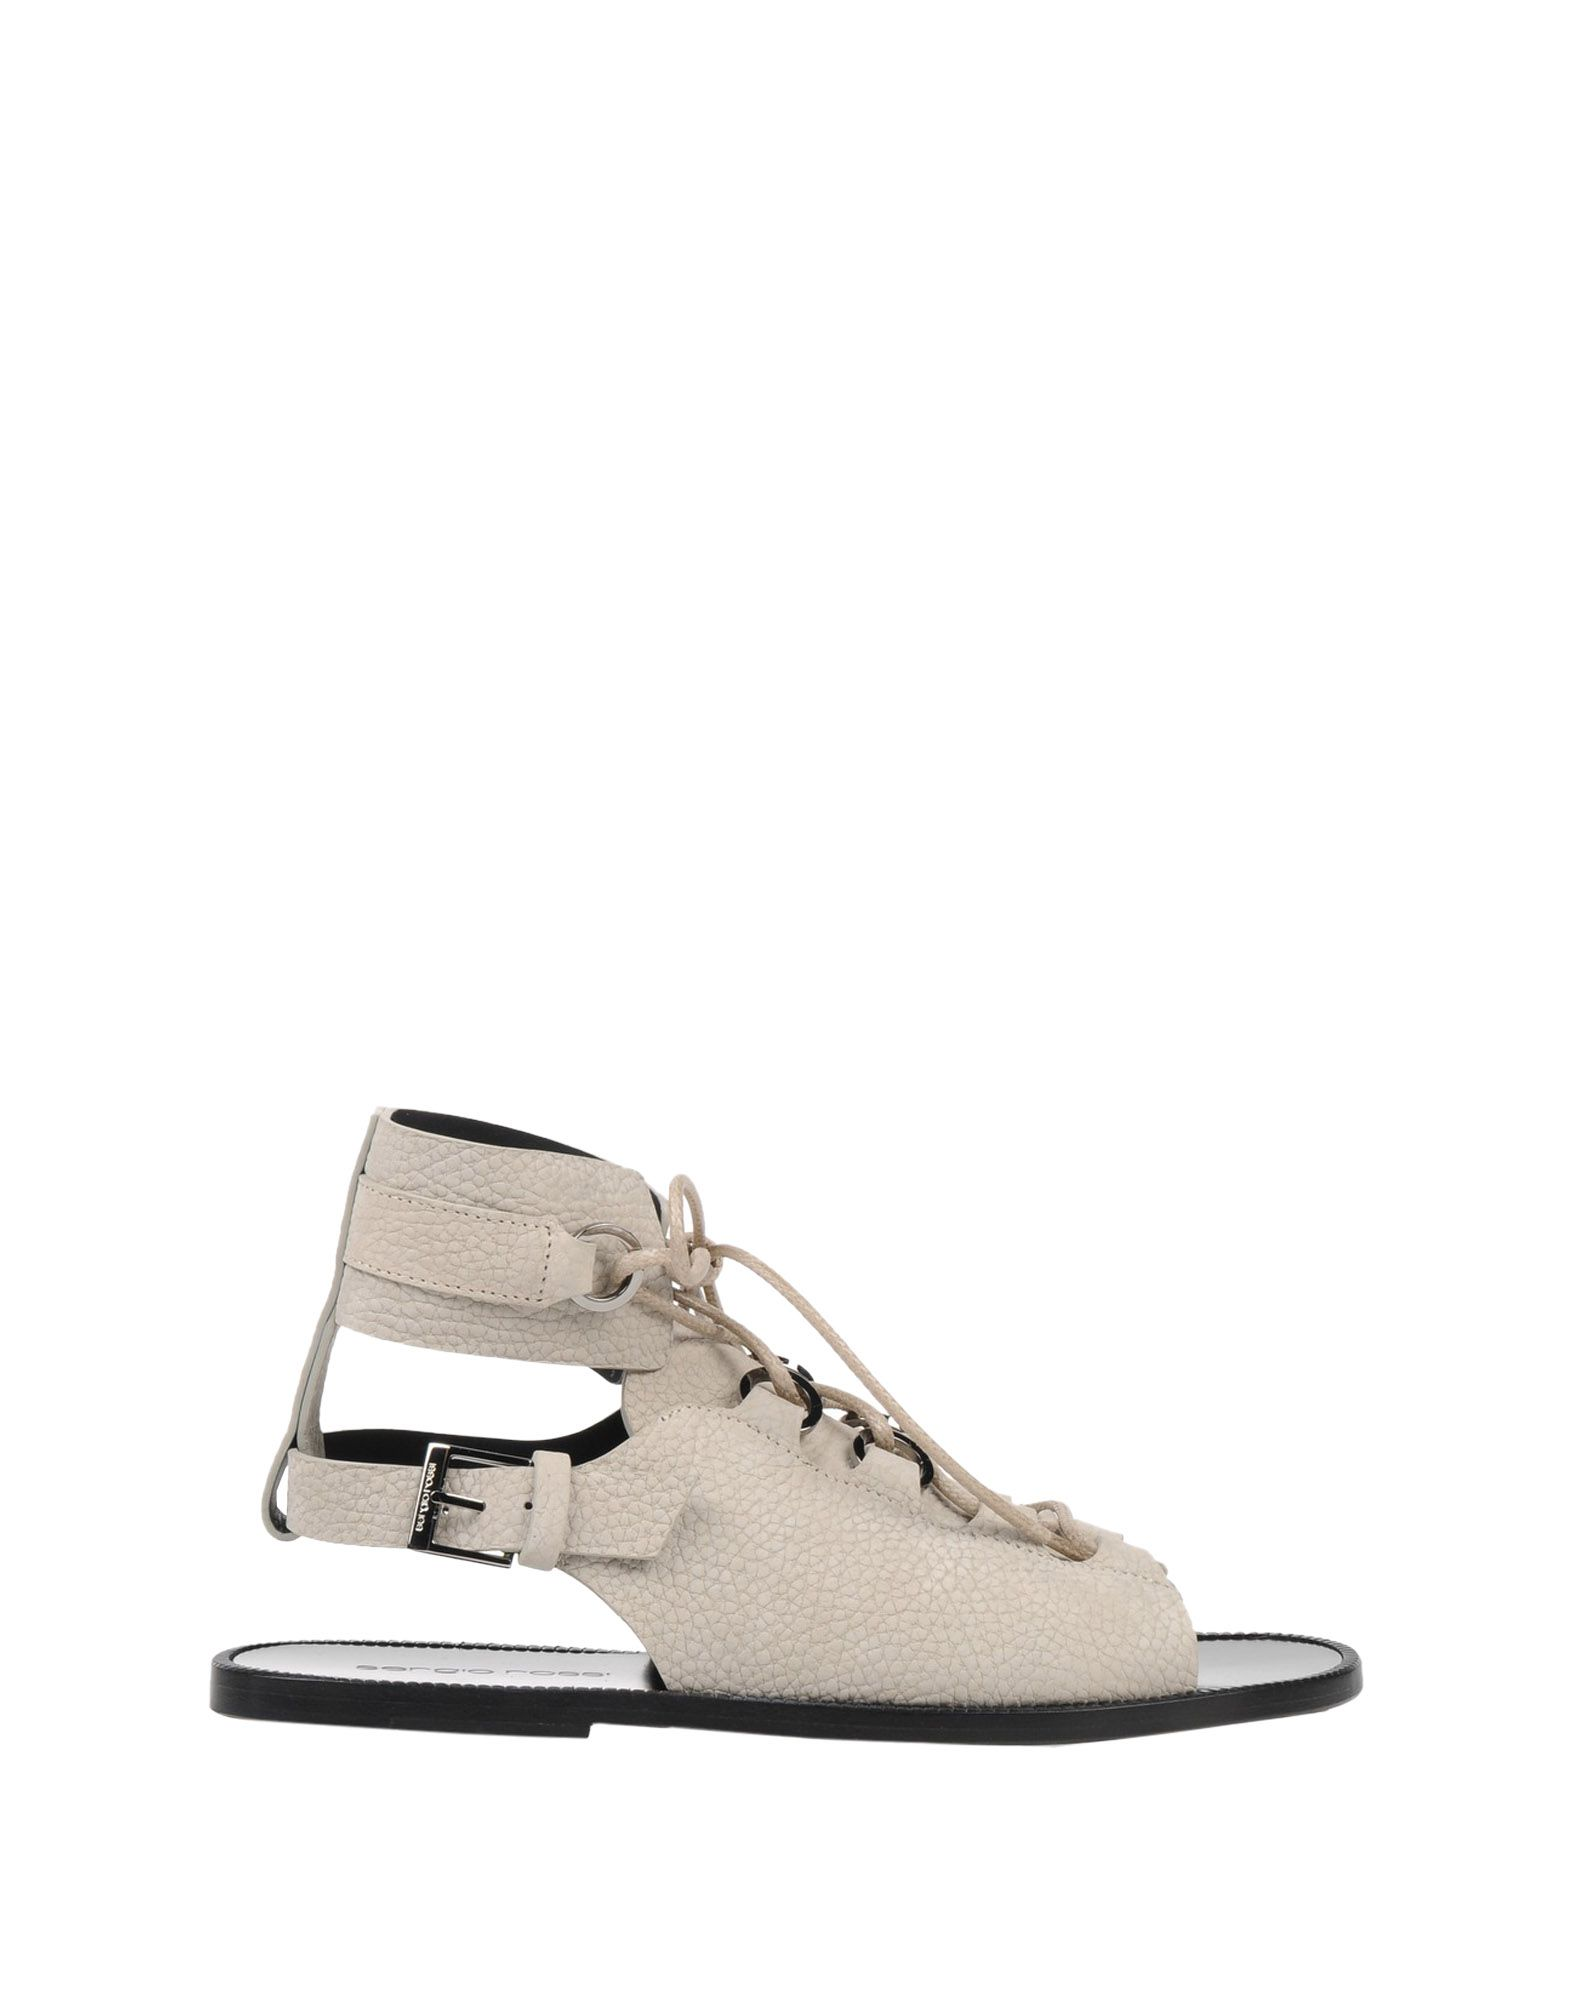 Sergio Rossi Sandalen Herren beliebte  11412485PC Gute Qualität beliebte Herren Schuhe cca225